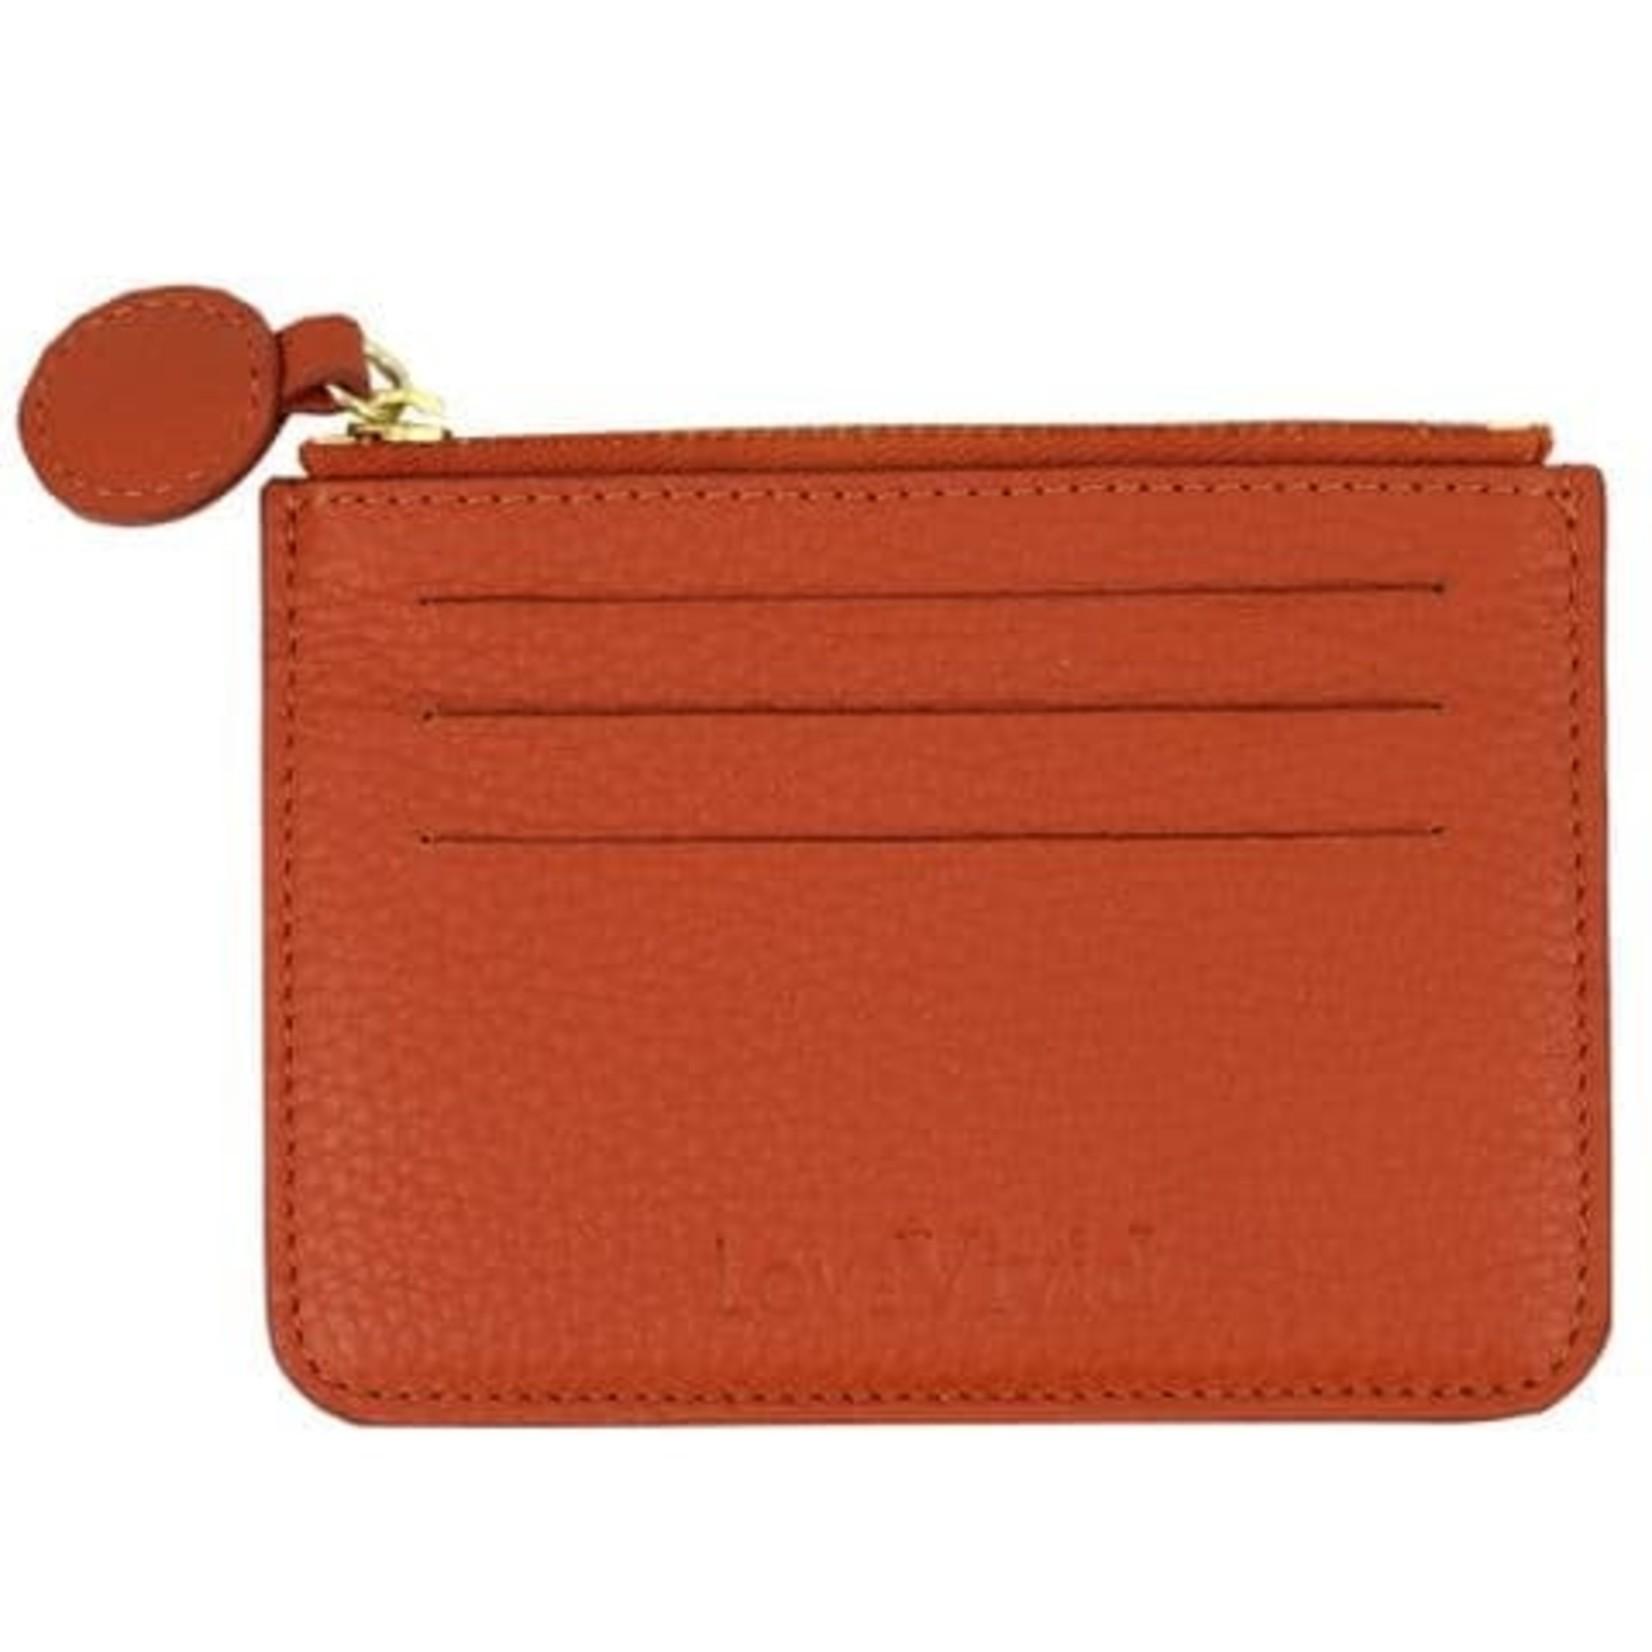 Vivid Credit Card Wallet in Orange